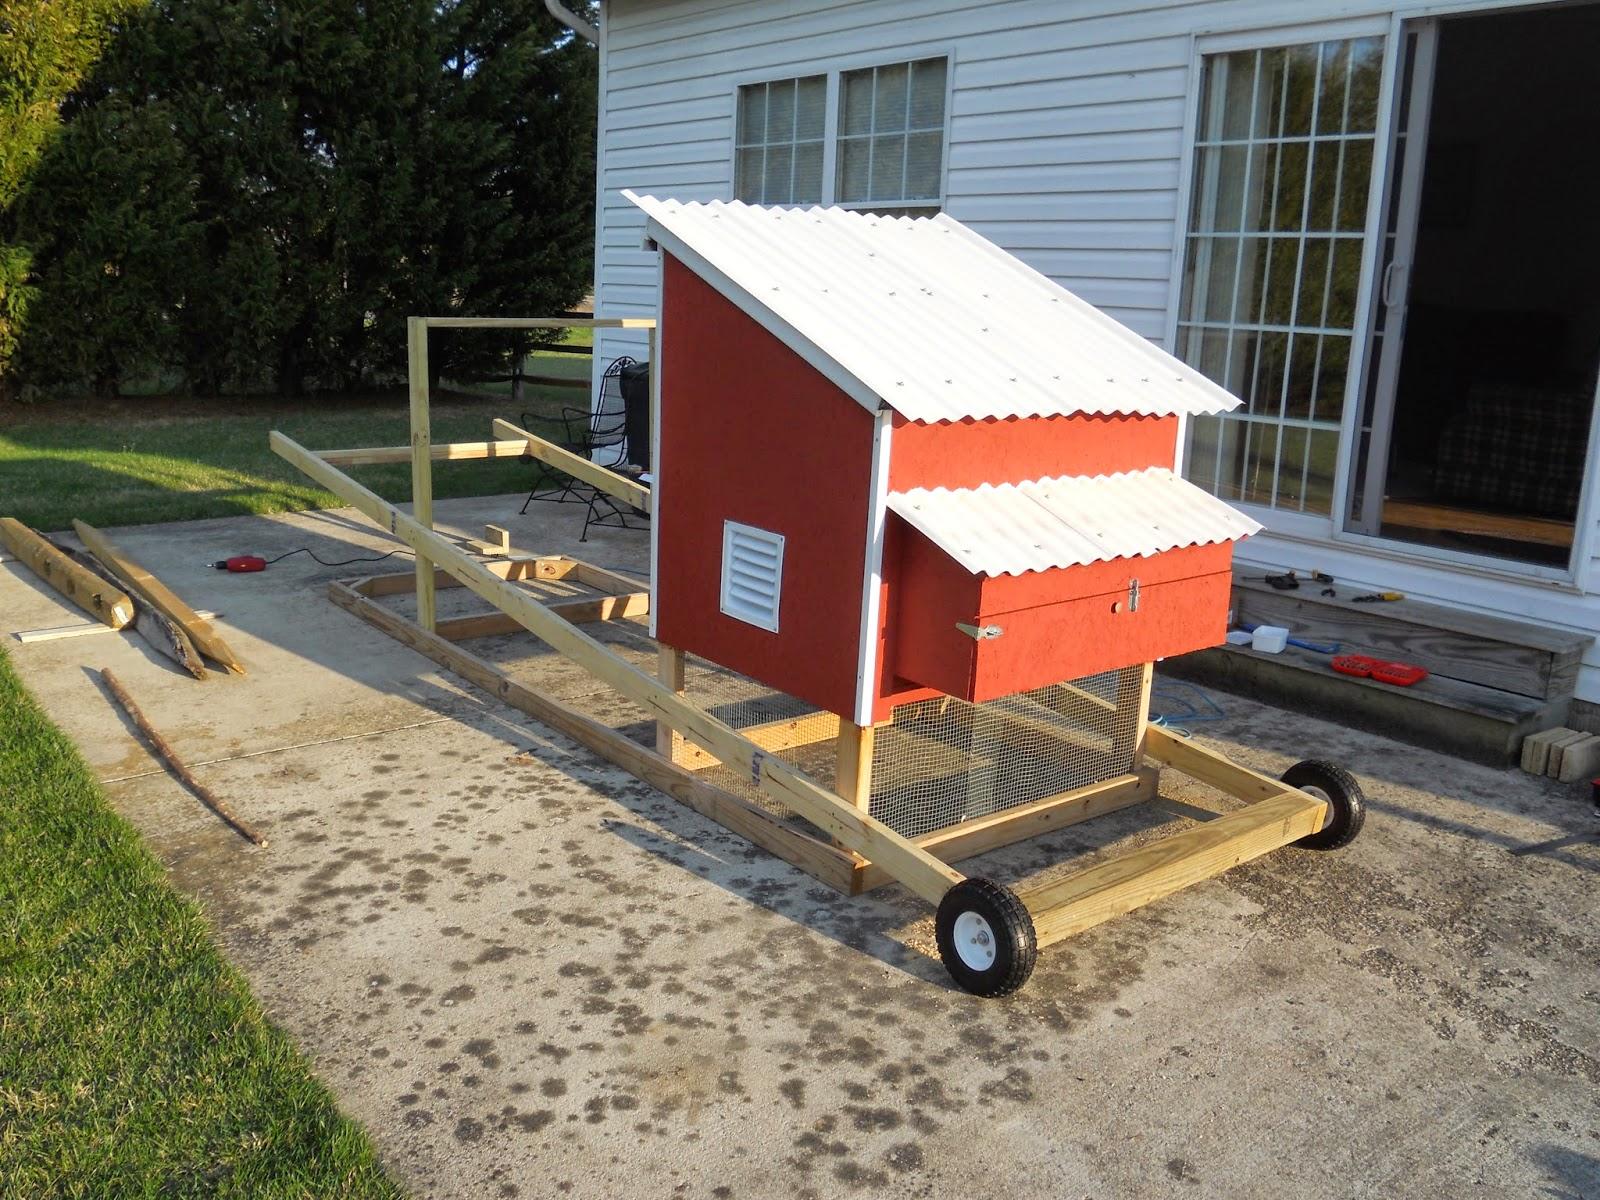 Chicken Tractors On Wheels : The food patch nano farm chicken tractor update wheel